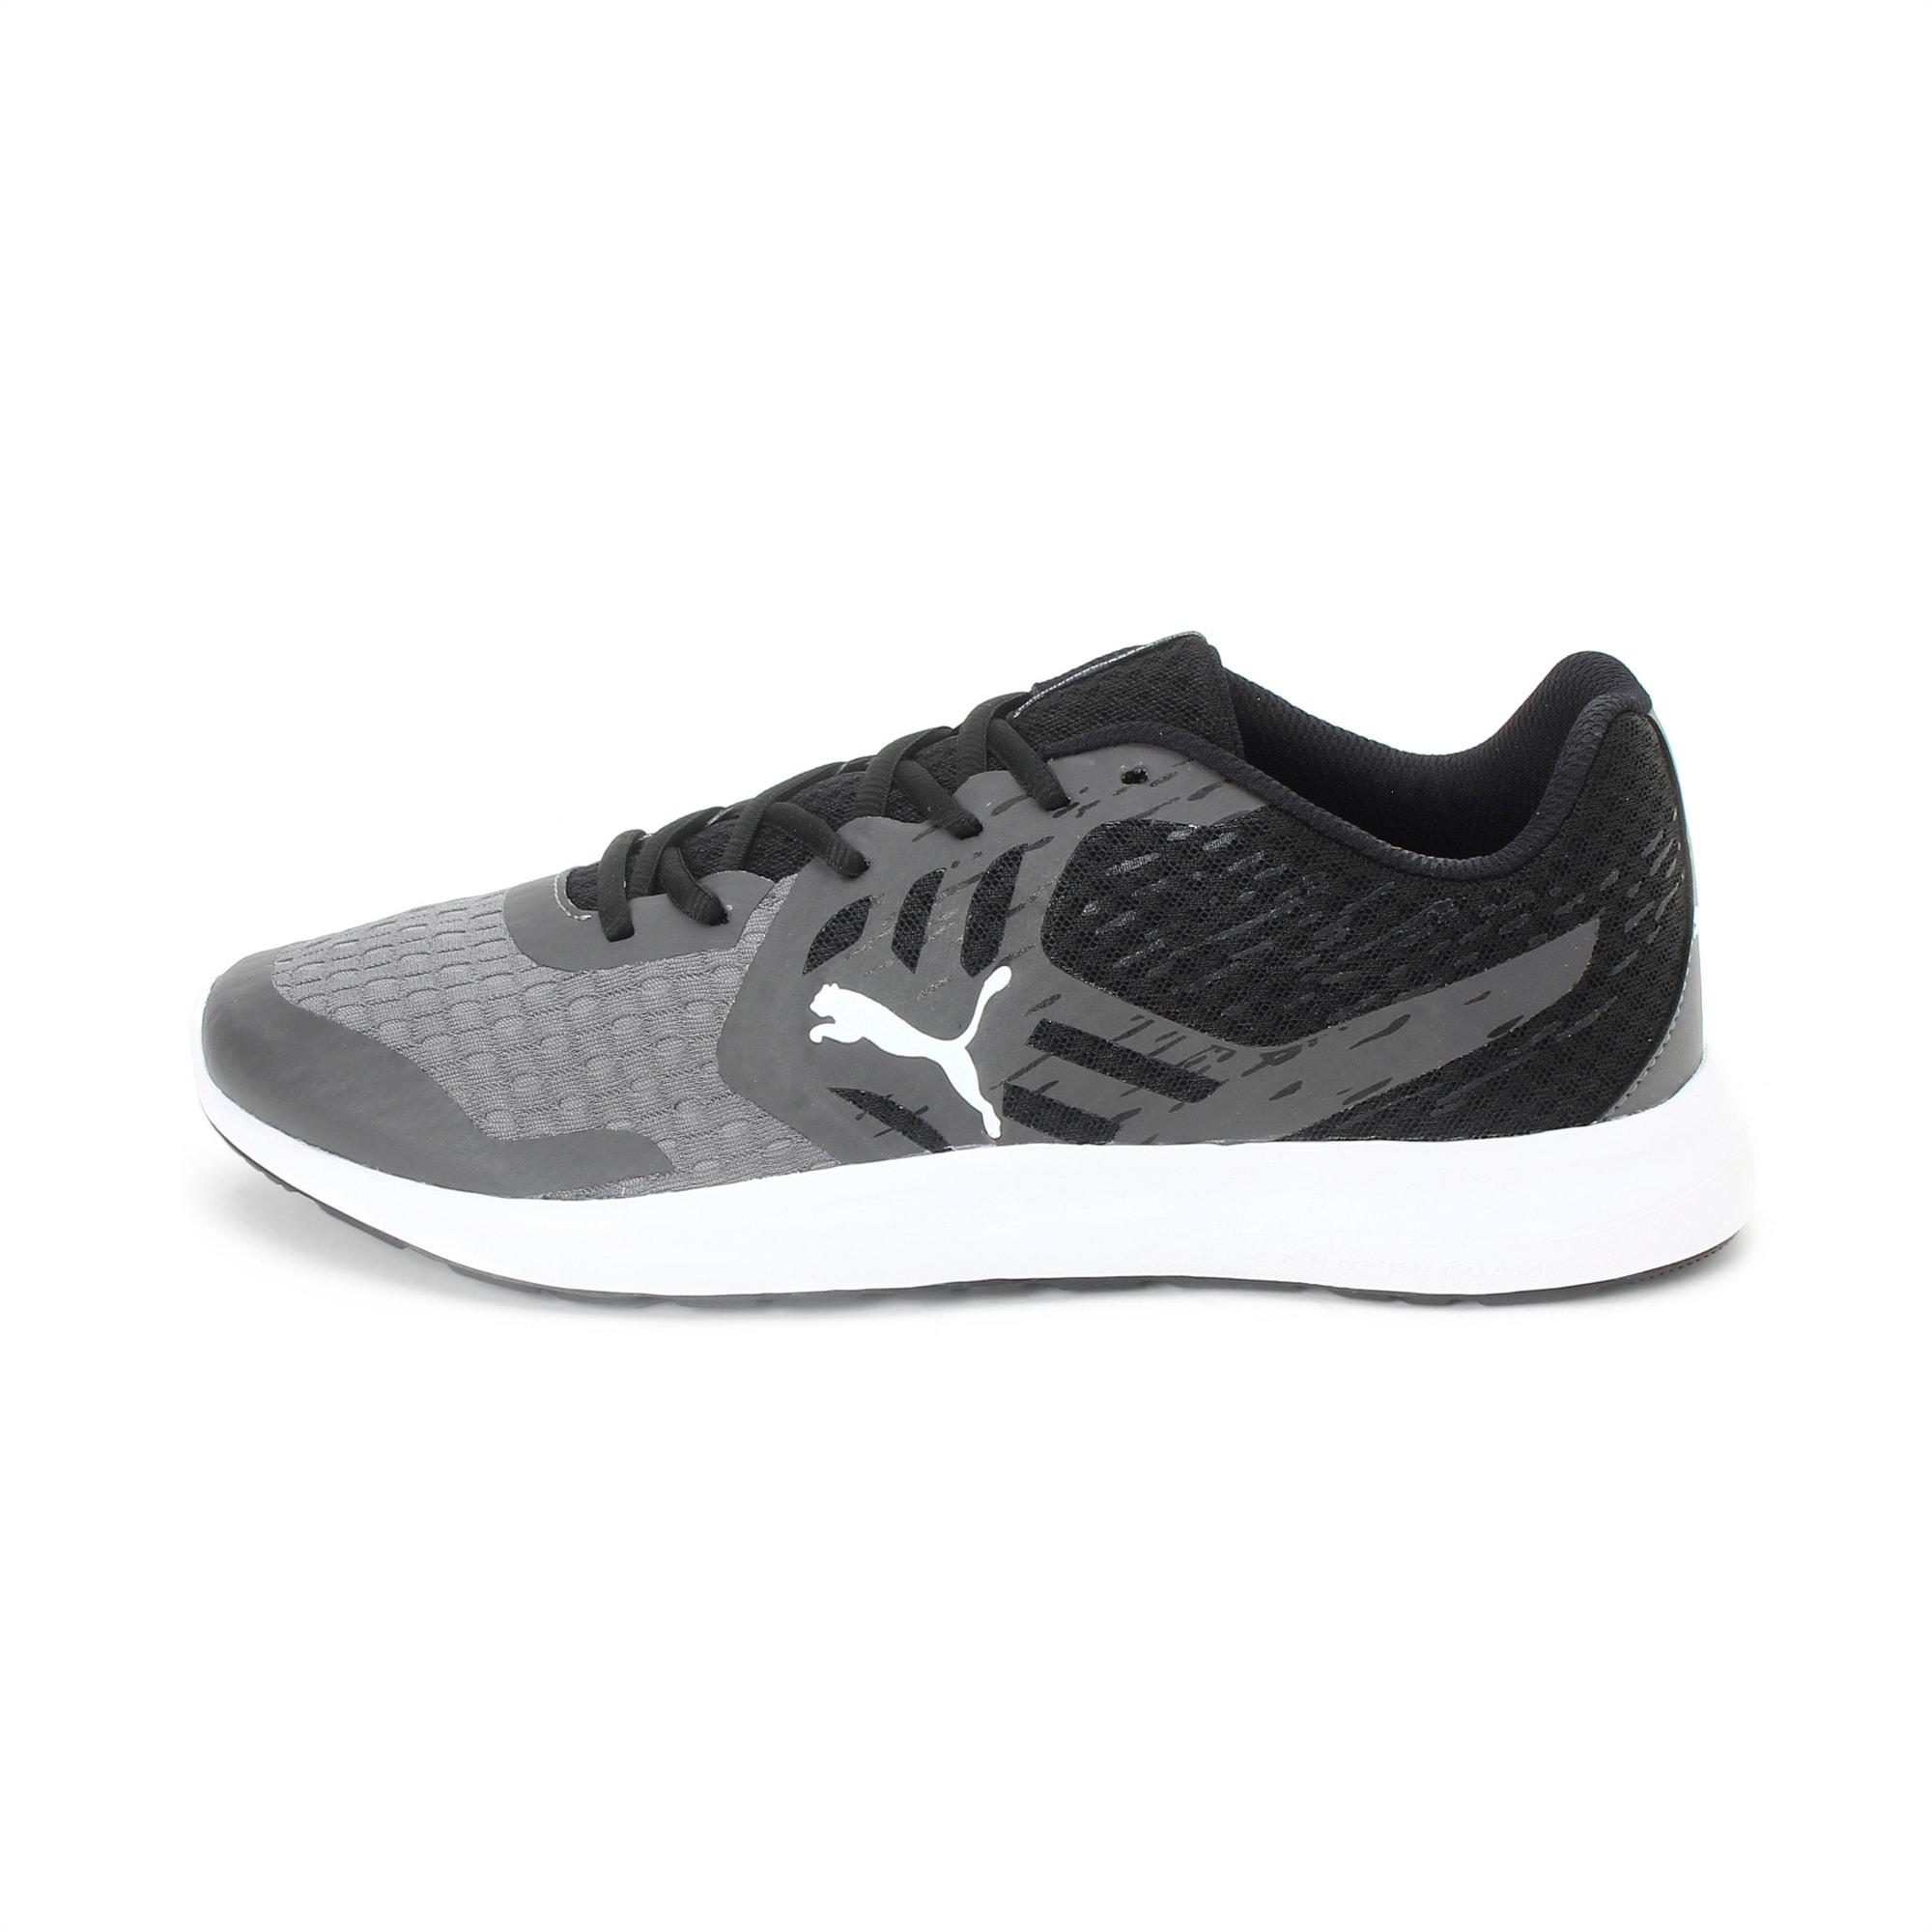 puma gamble xt idp running shoes